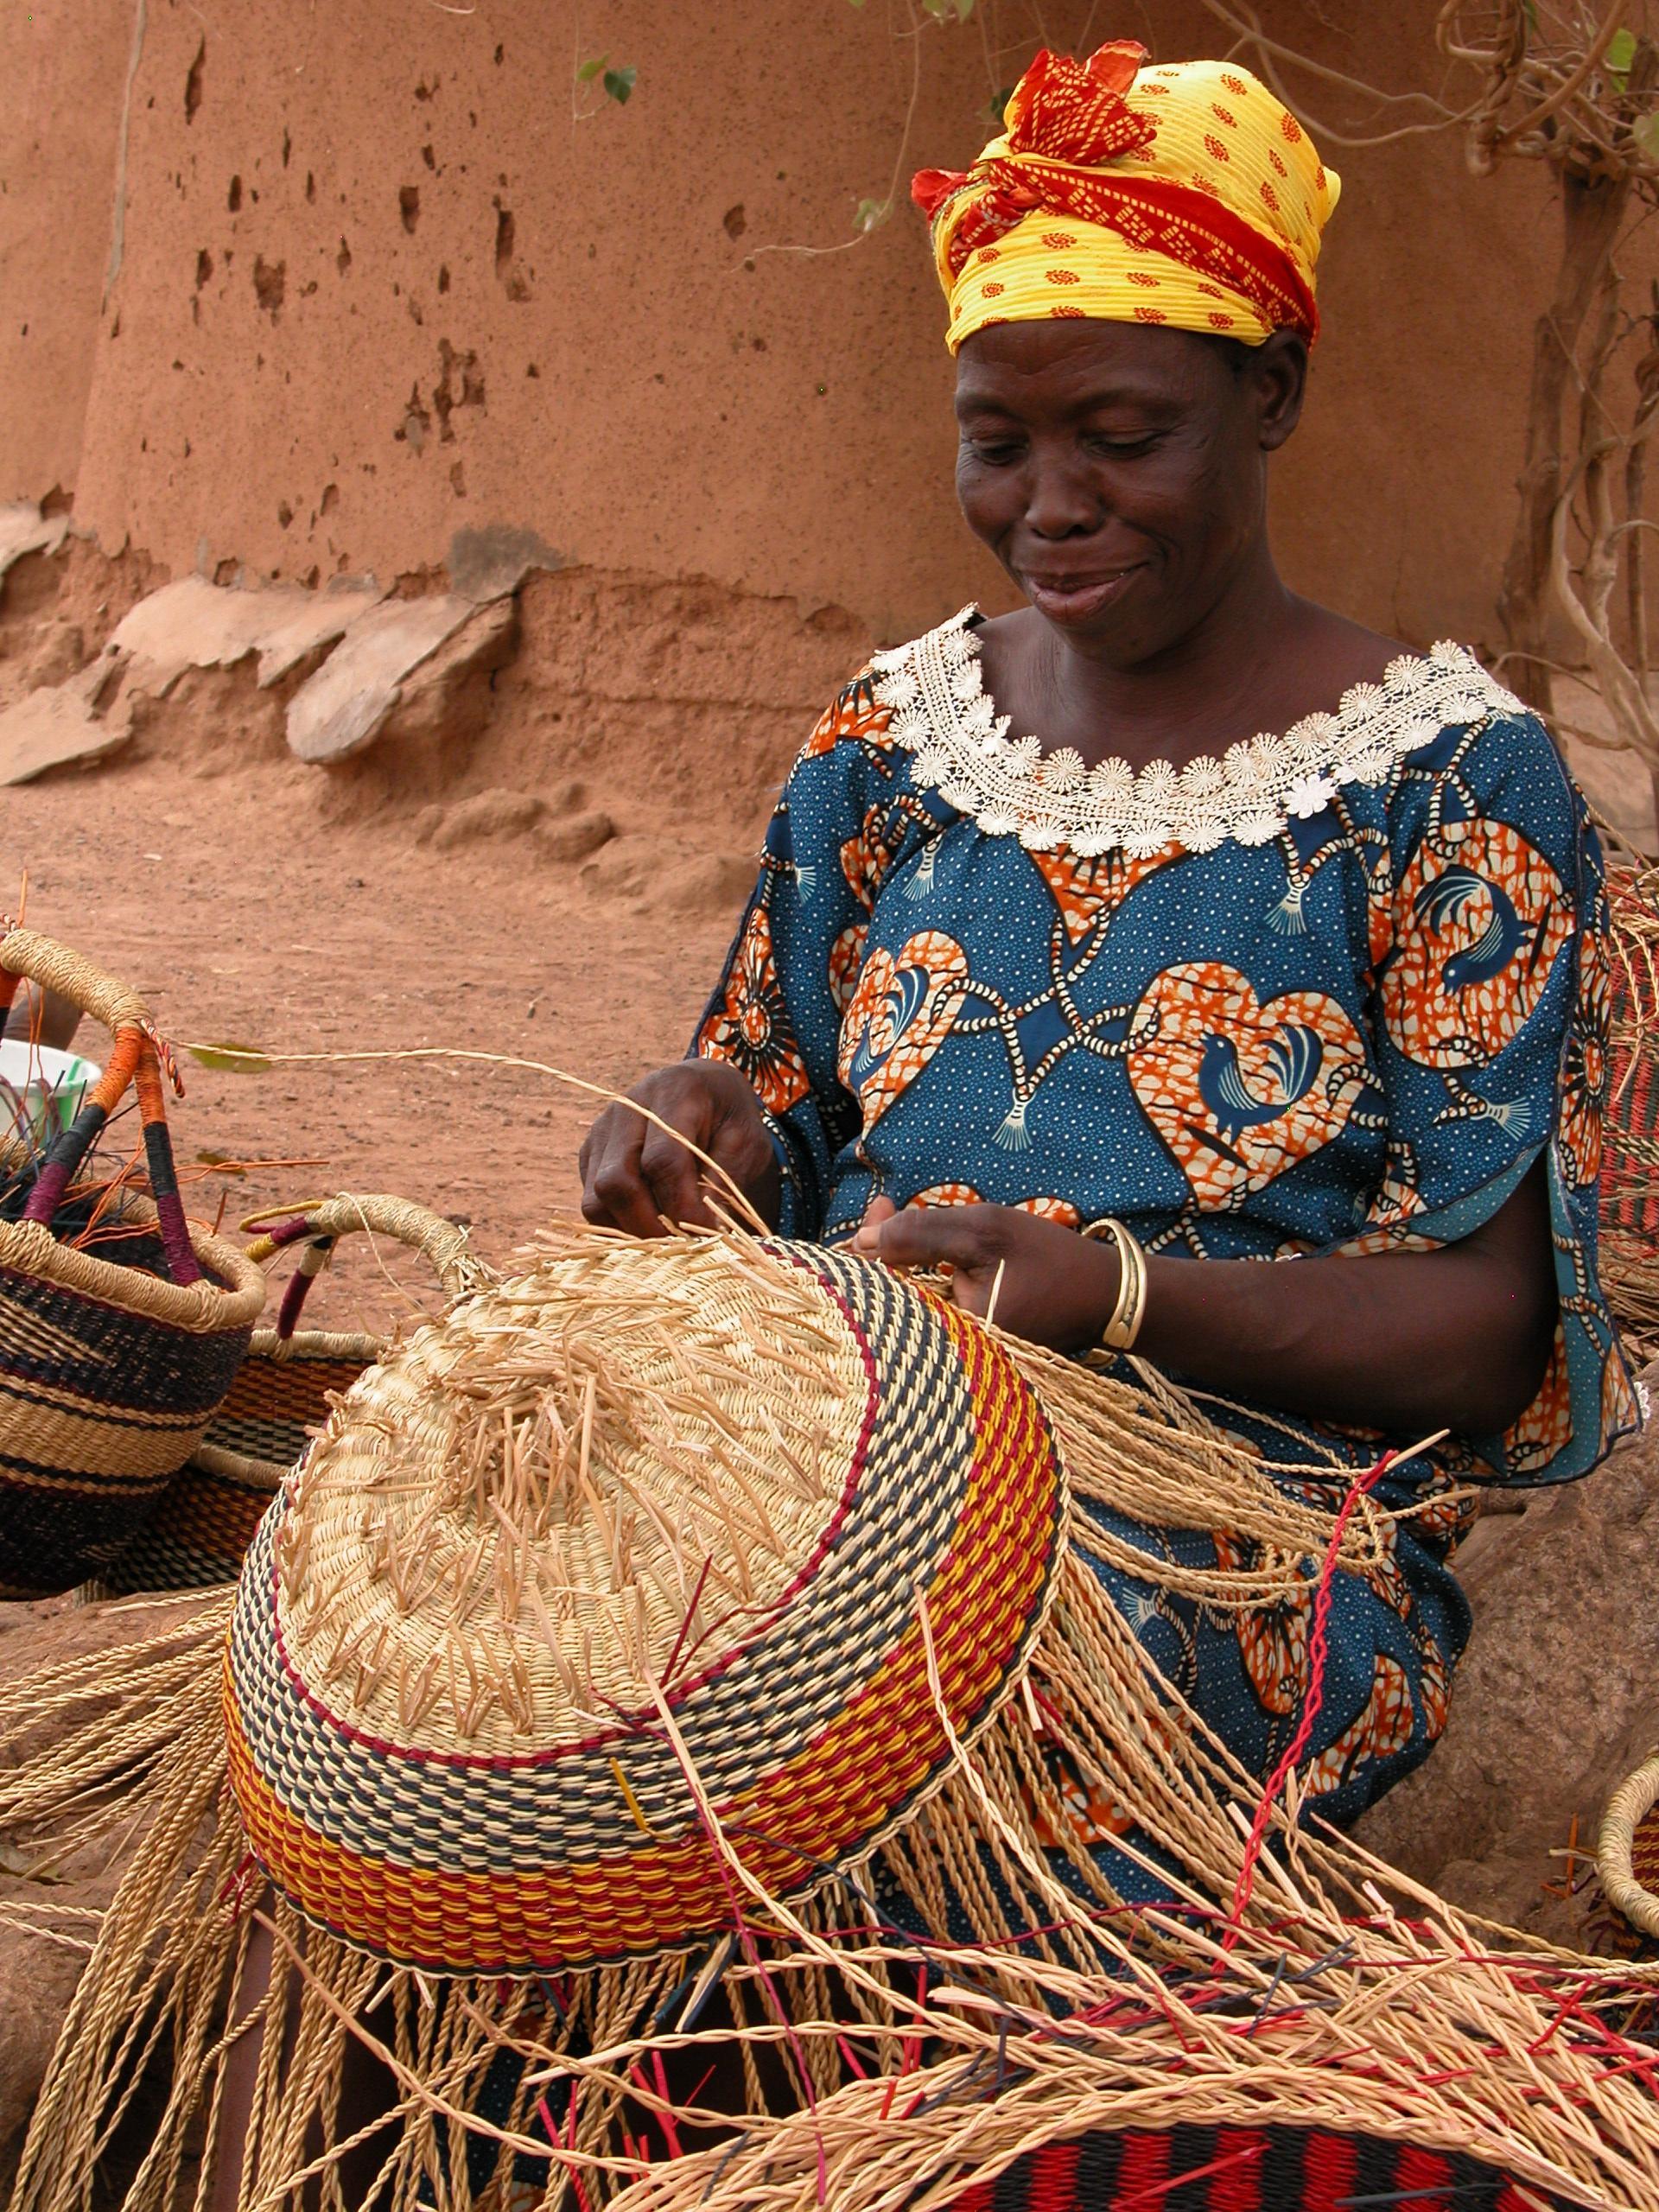 african-market-baskets2.jpg